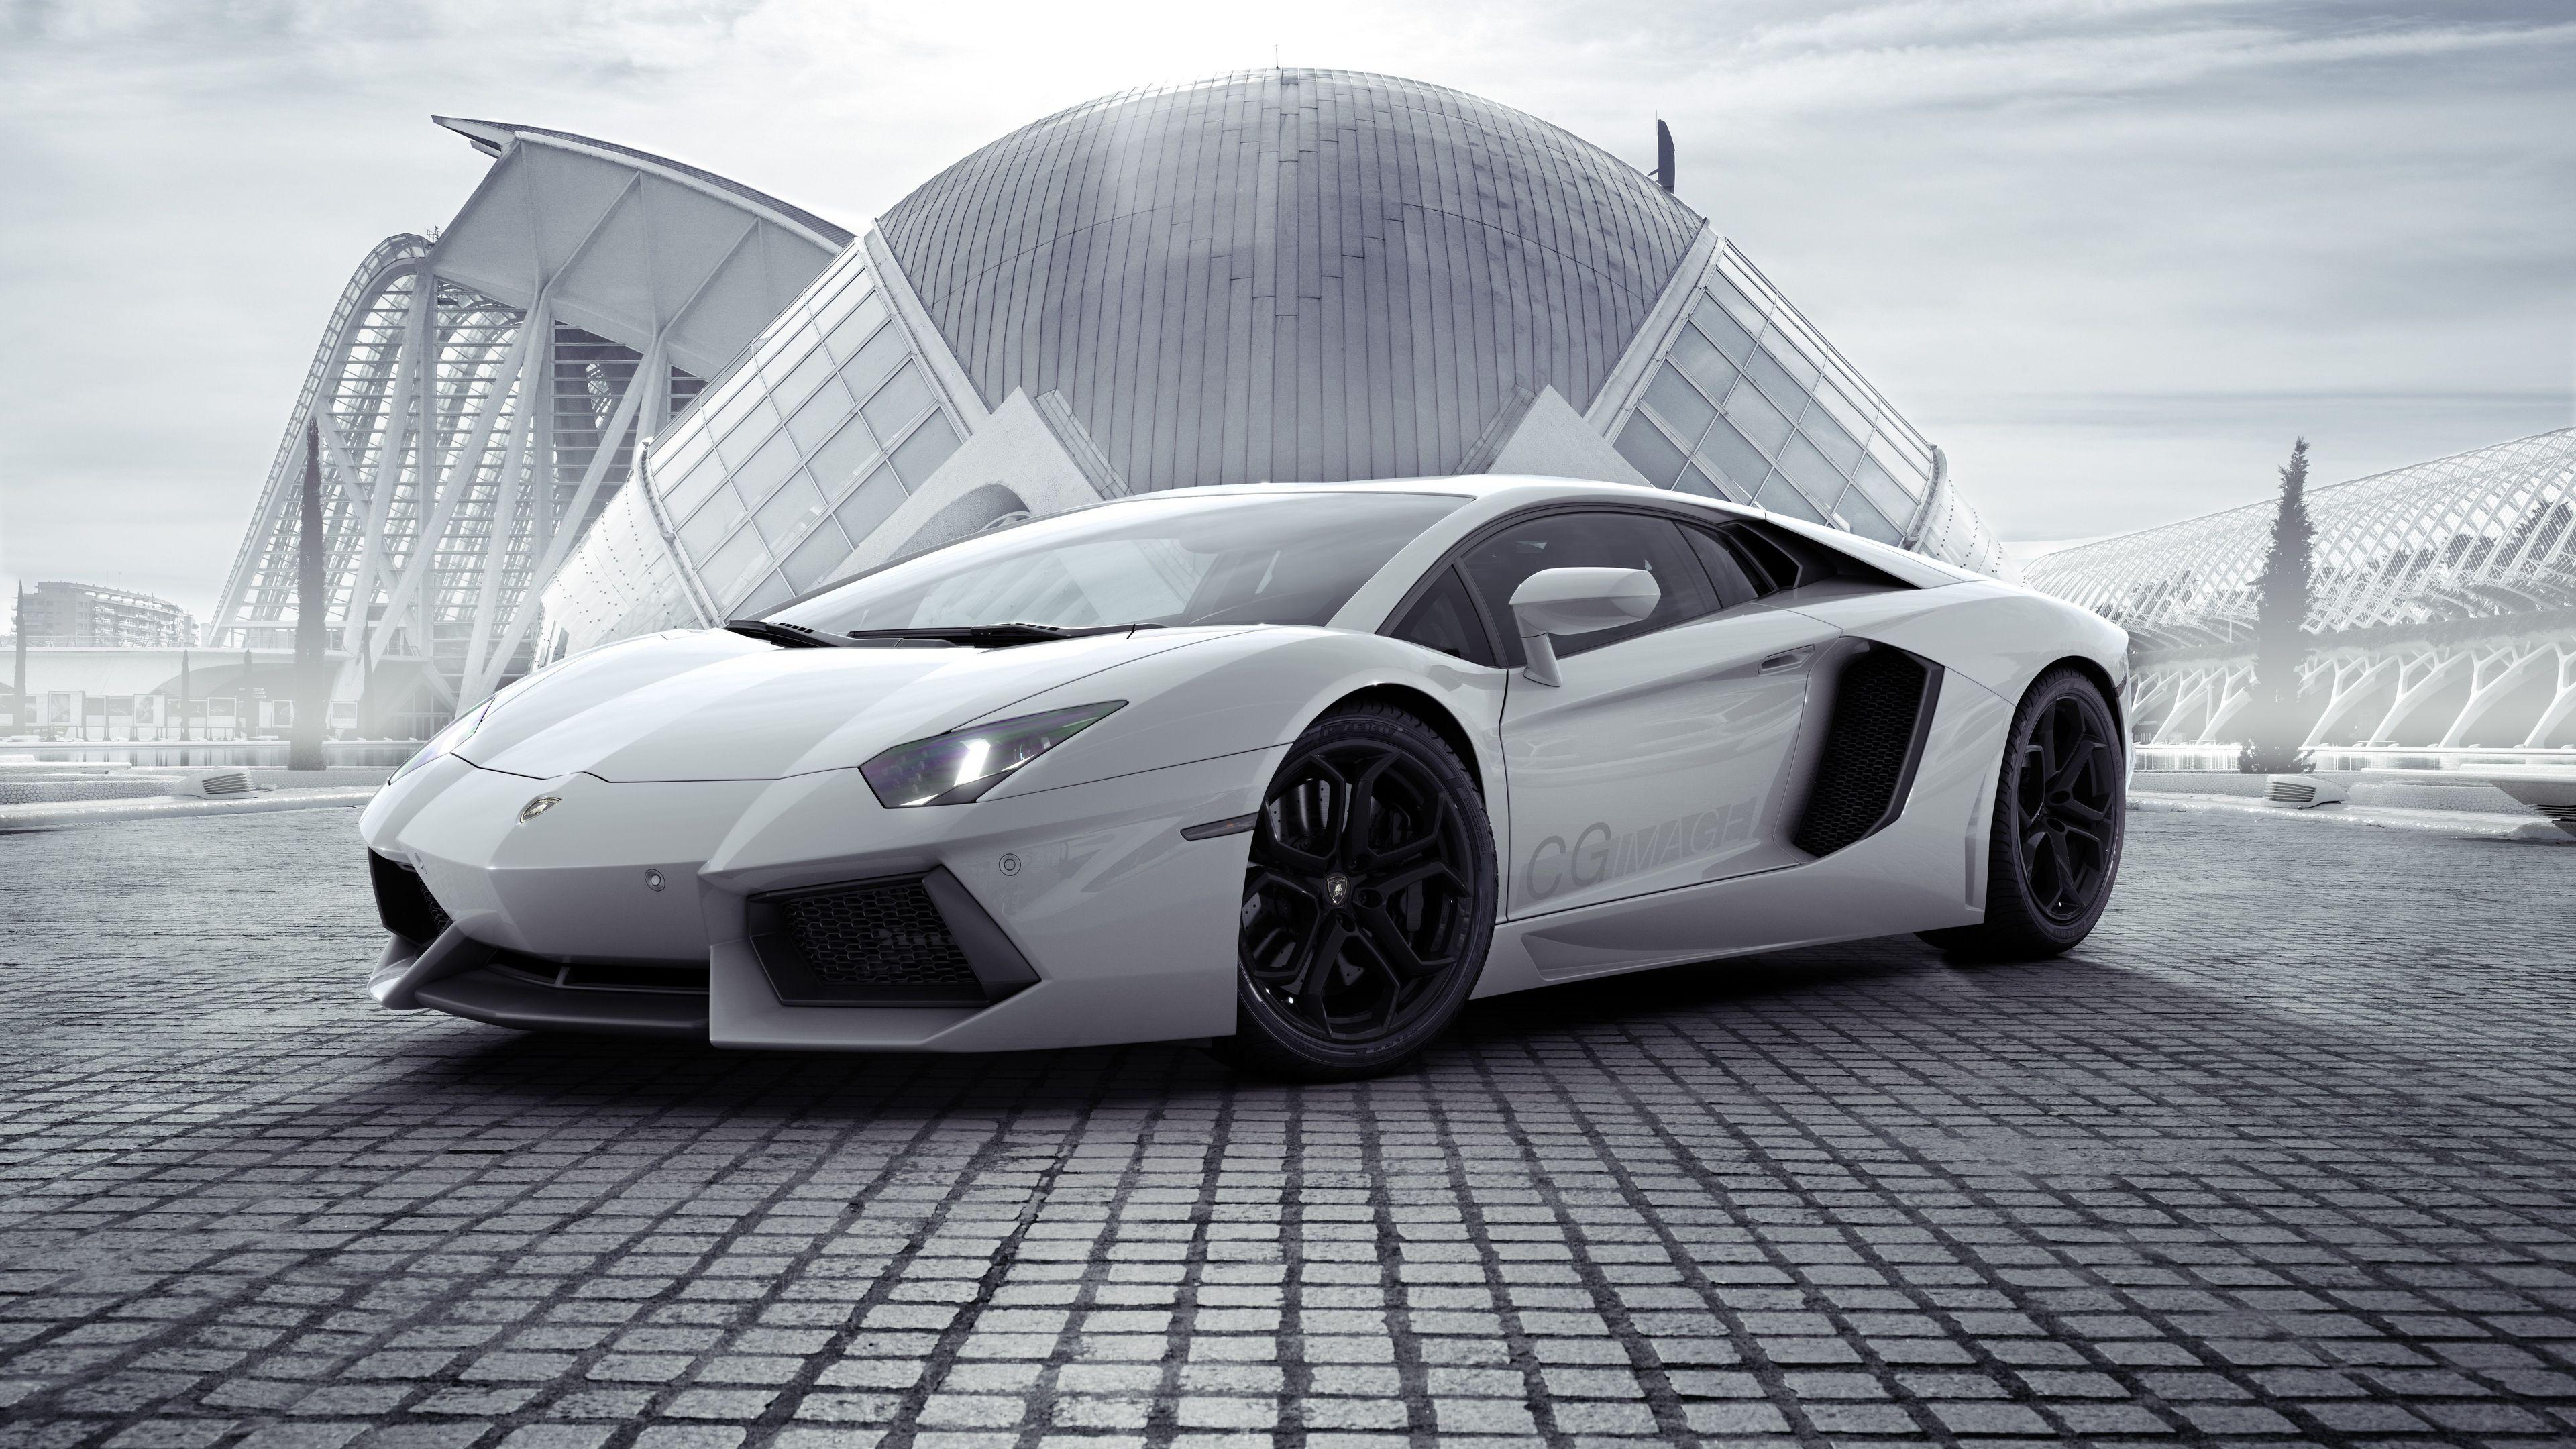 white lamborghini aventador new 4k 1546361650 - White Lamborghini Aventador New 4k - lamborghini wallpapers, lamborghini aventador wallpapers, hd-wallpapers, cars wallpapers, 8k wallpapers, 5k wallpapers, 4k-wallpapers